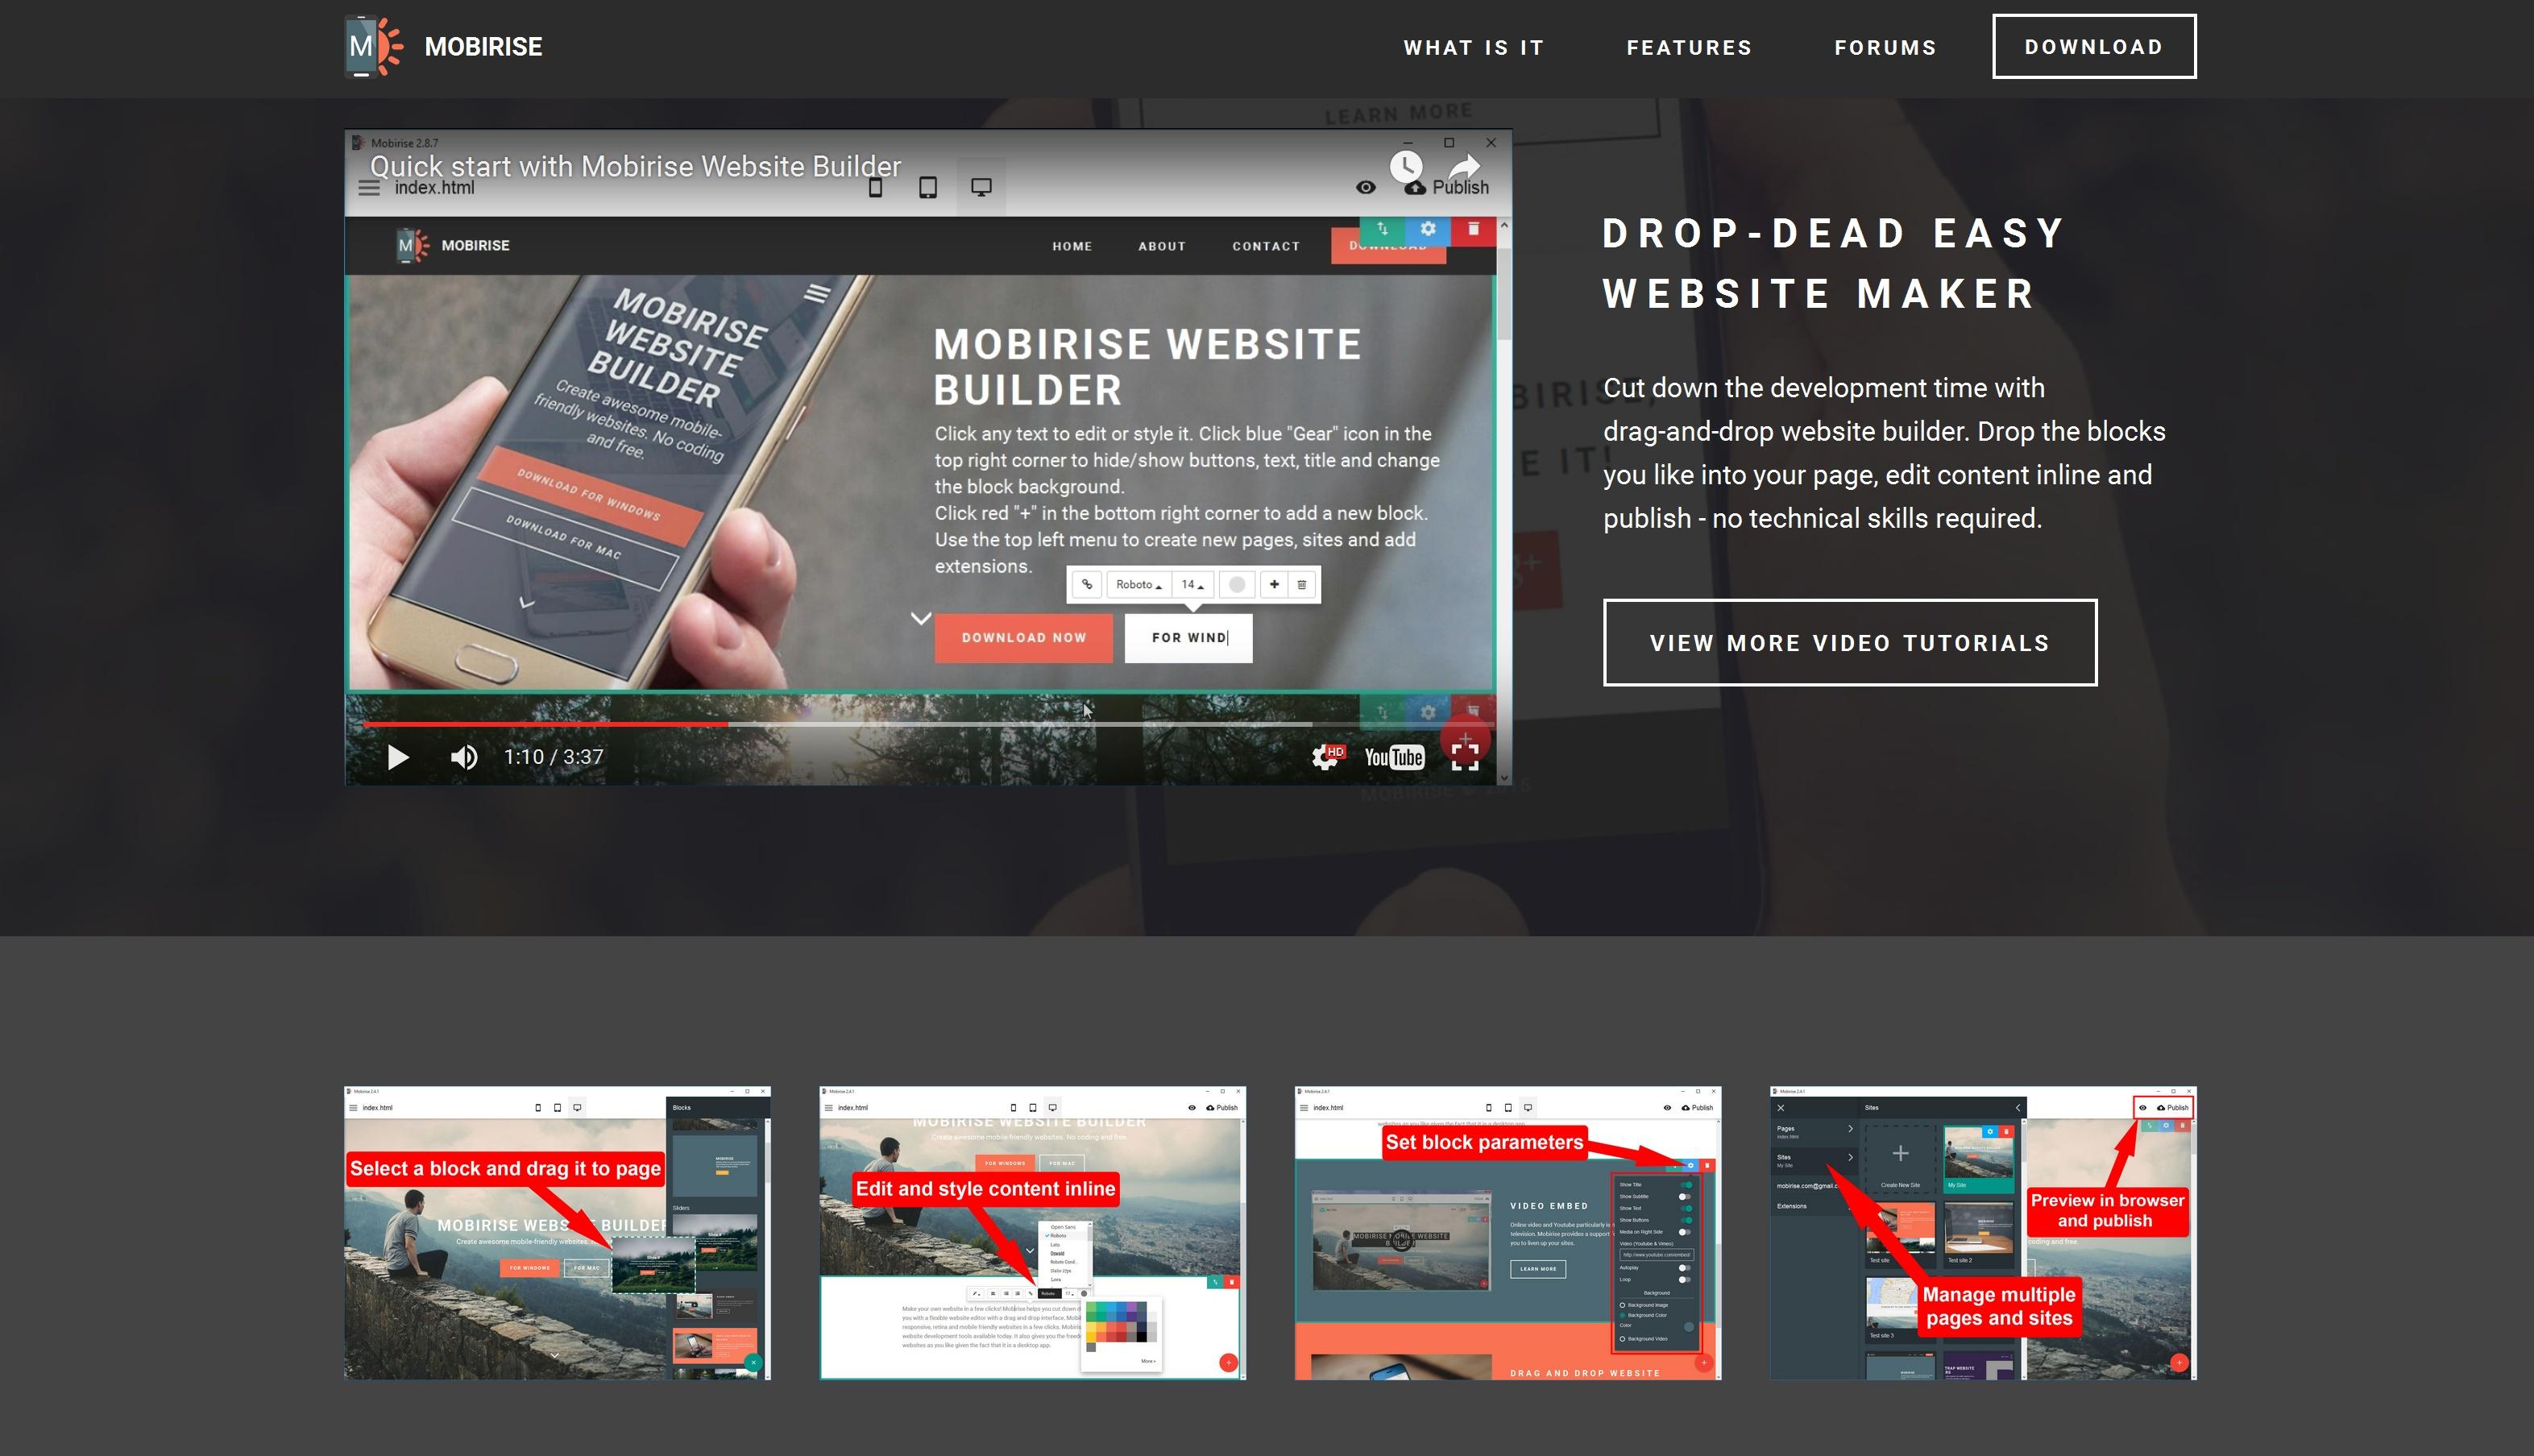 WYSIWYG Mobile Website Creator Software